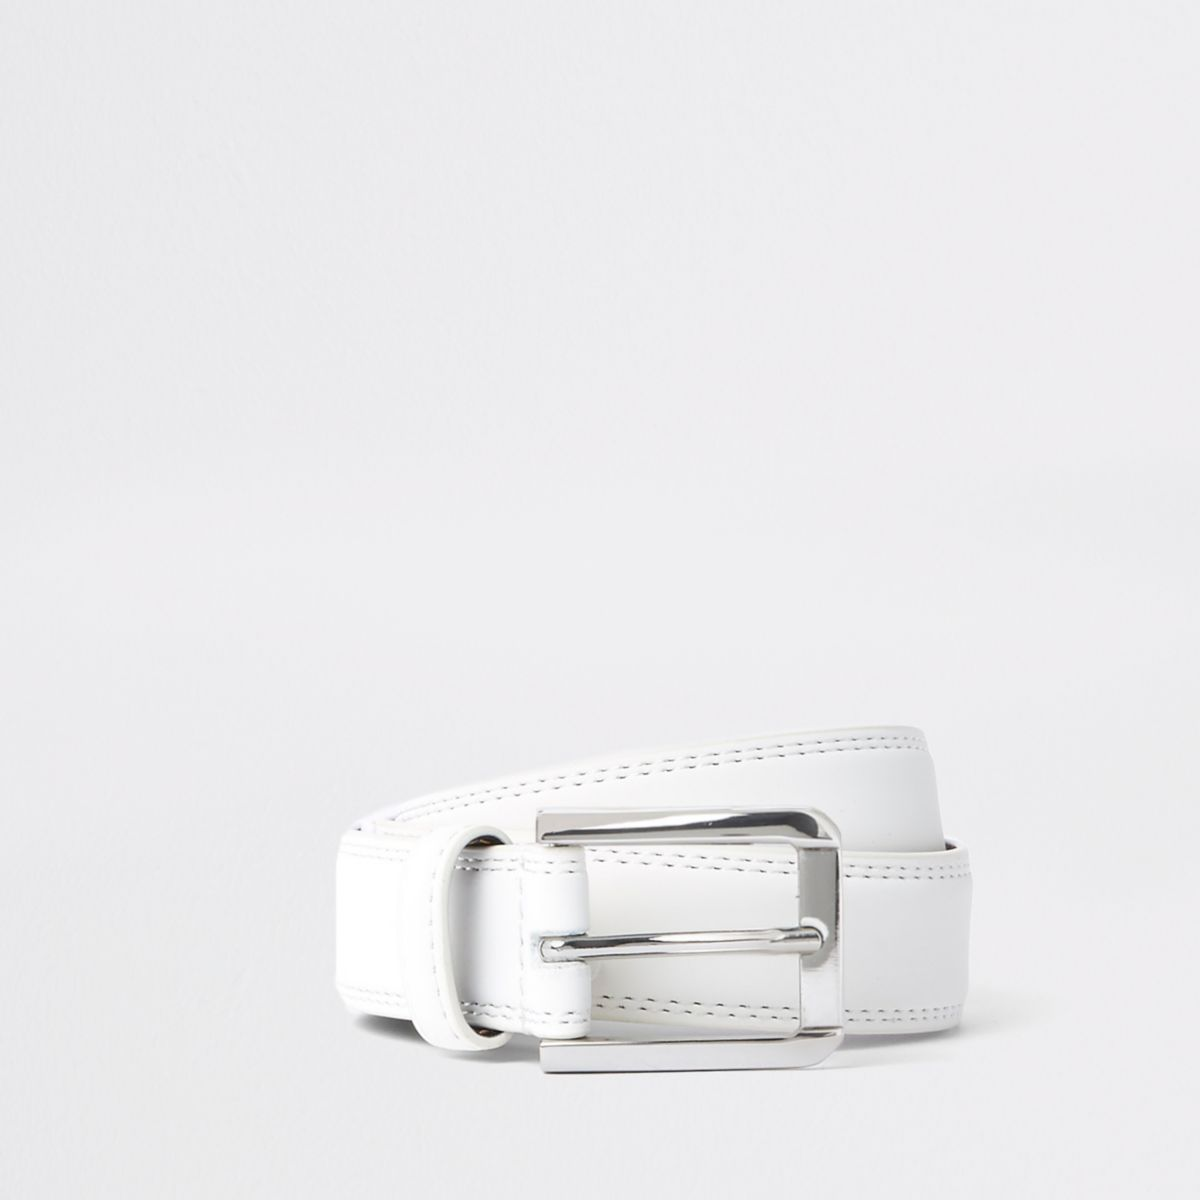 White silver tone buckle belt